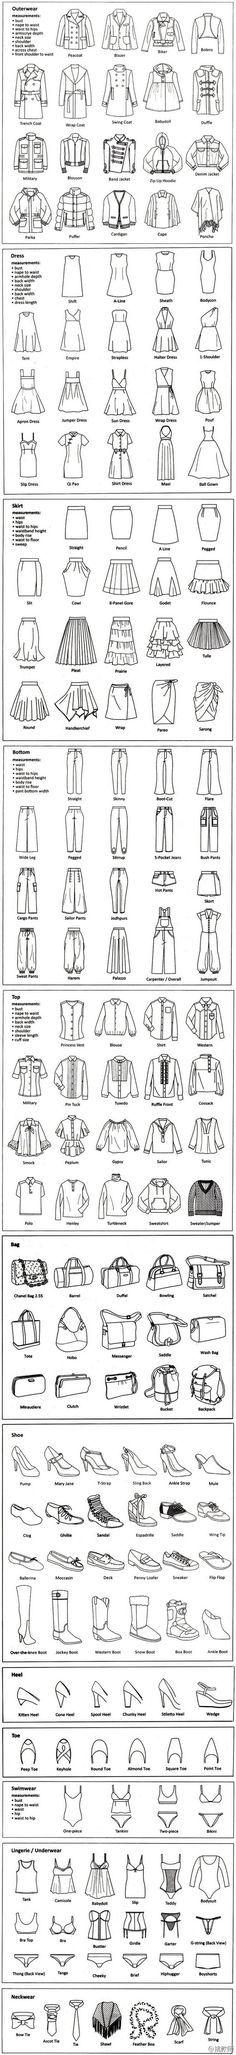 Garment Fashion Terminology   Fashion Design Sewing, Resources, Techniques, and Tutorials   Ideas for the Aspiring Fashion Designer